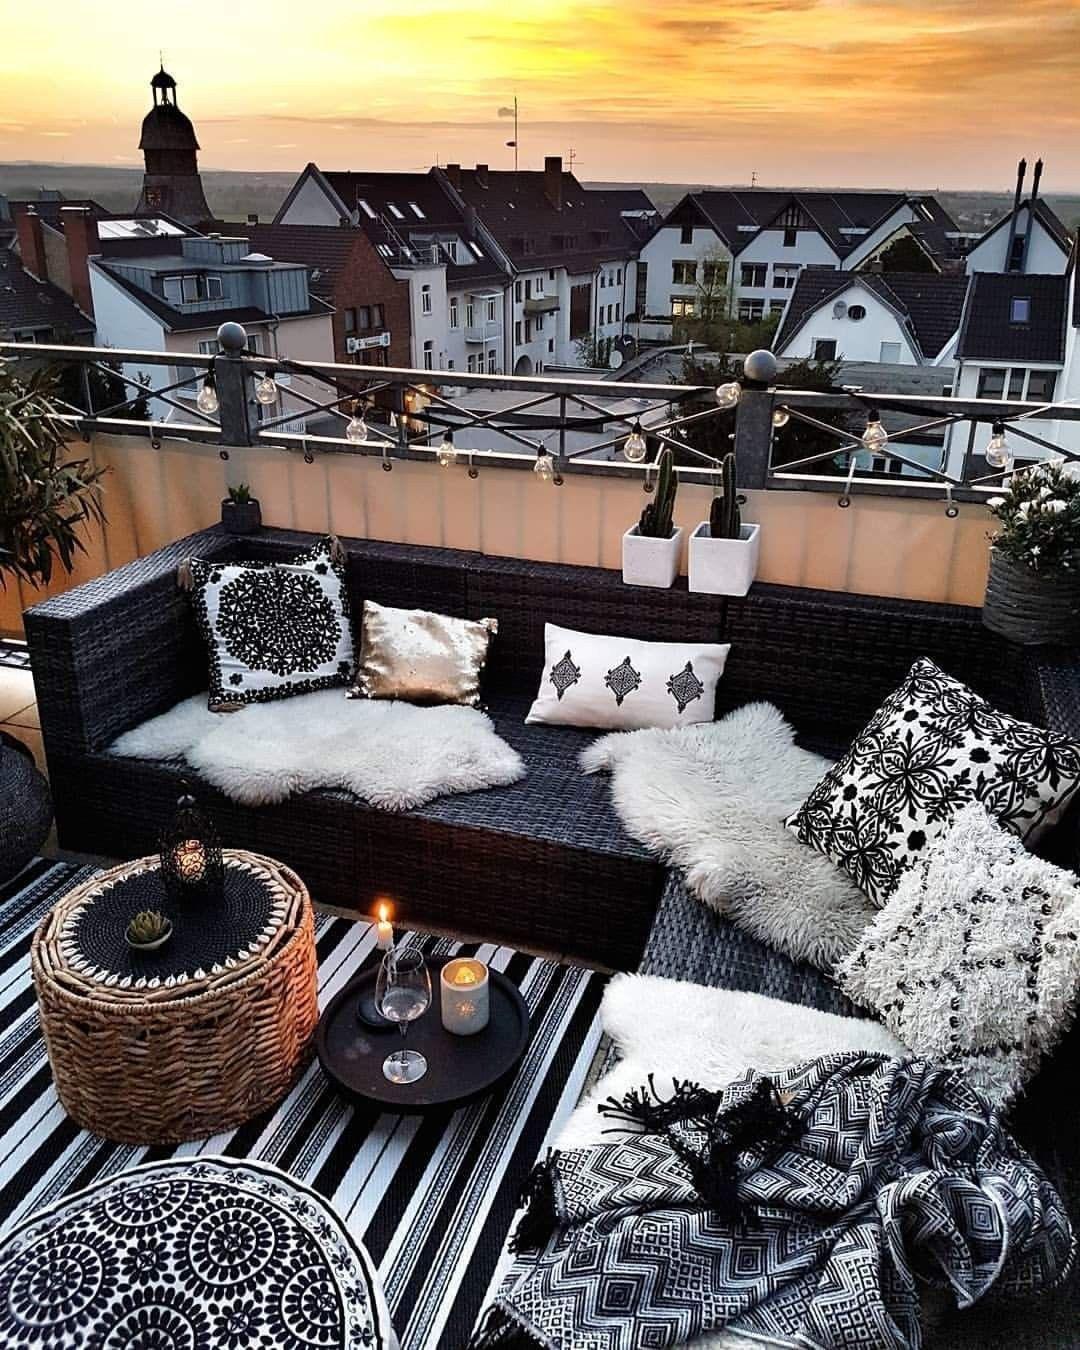 Black And White Deck Outdoor Living Decor Small Balcony Decor Balcony Decor